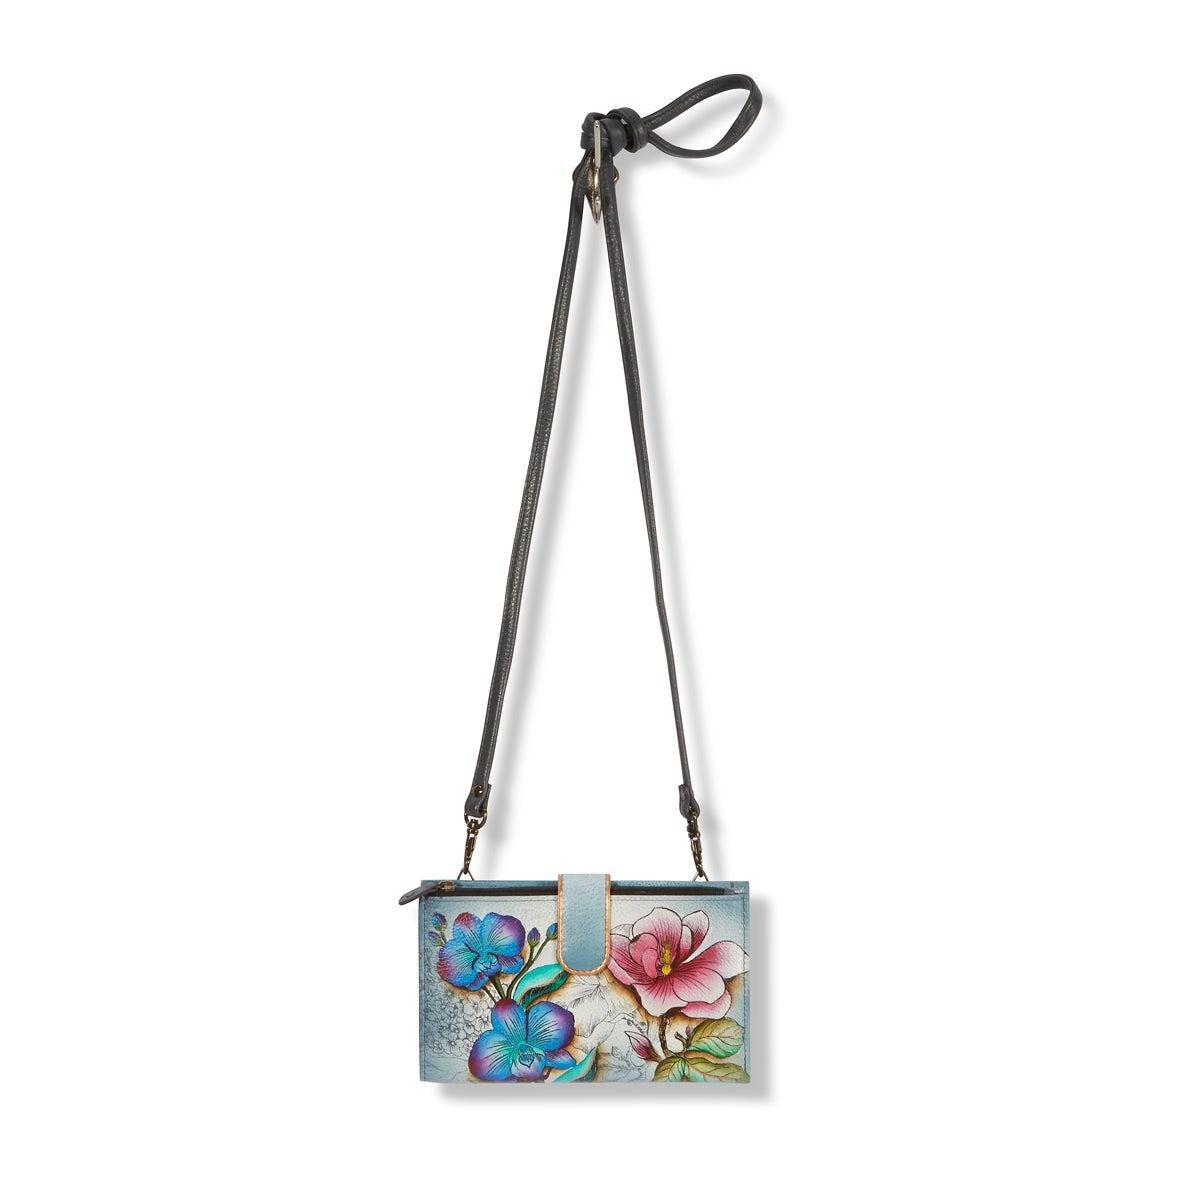 Printed lthr FloralFantasy phncse/wallet